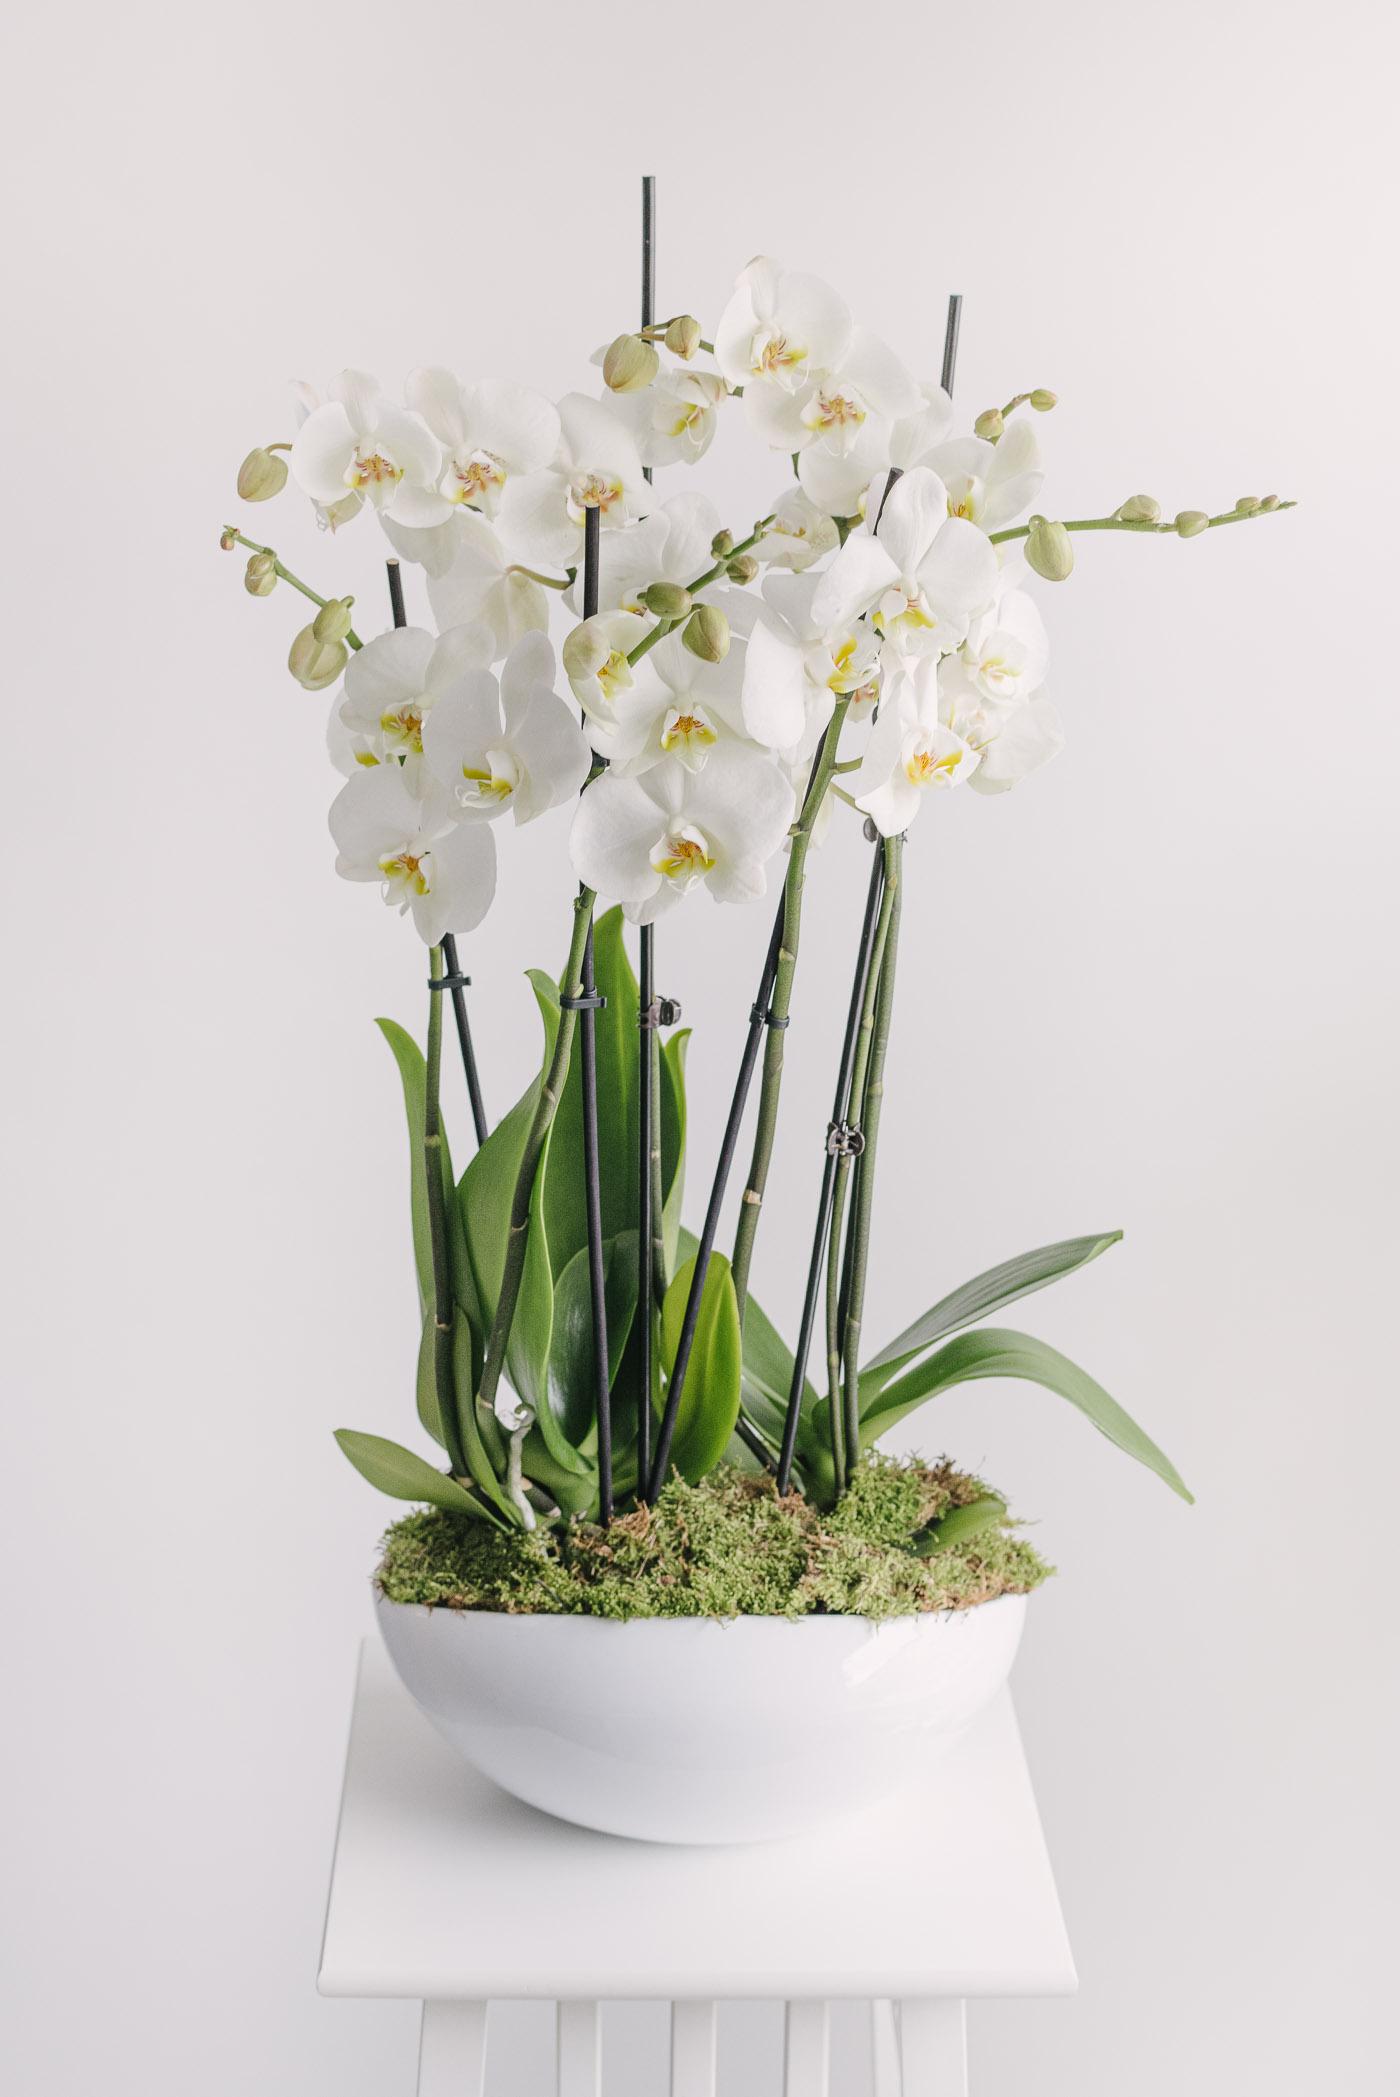 Aranjament In Vas Ceramic Cu Orhidee Si Muschi